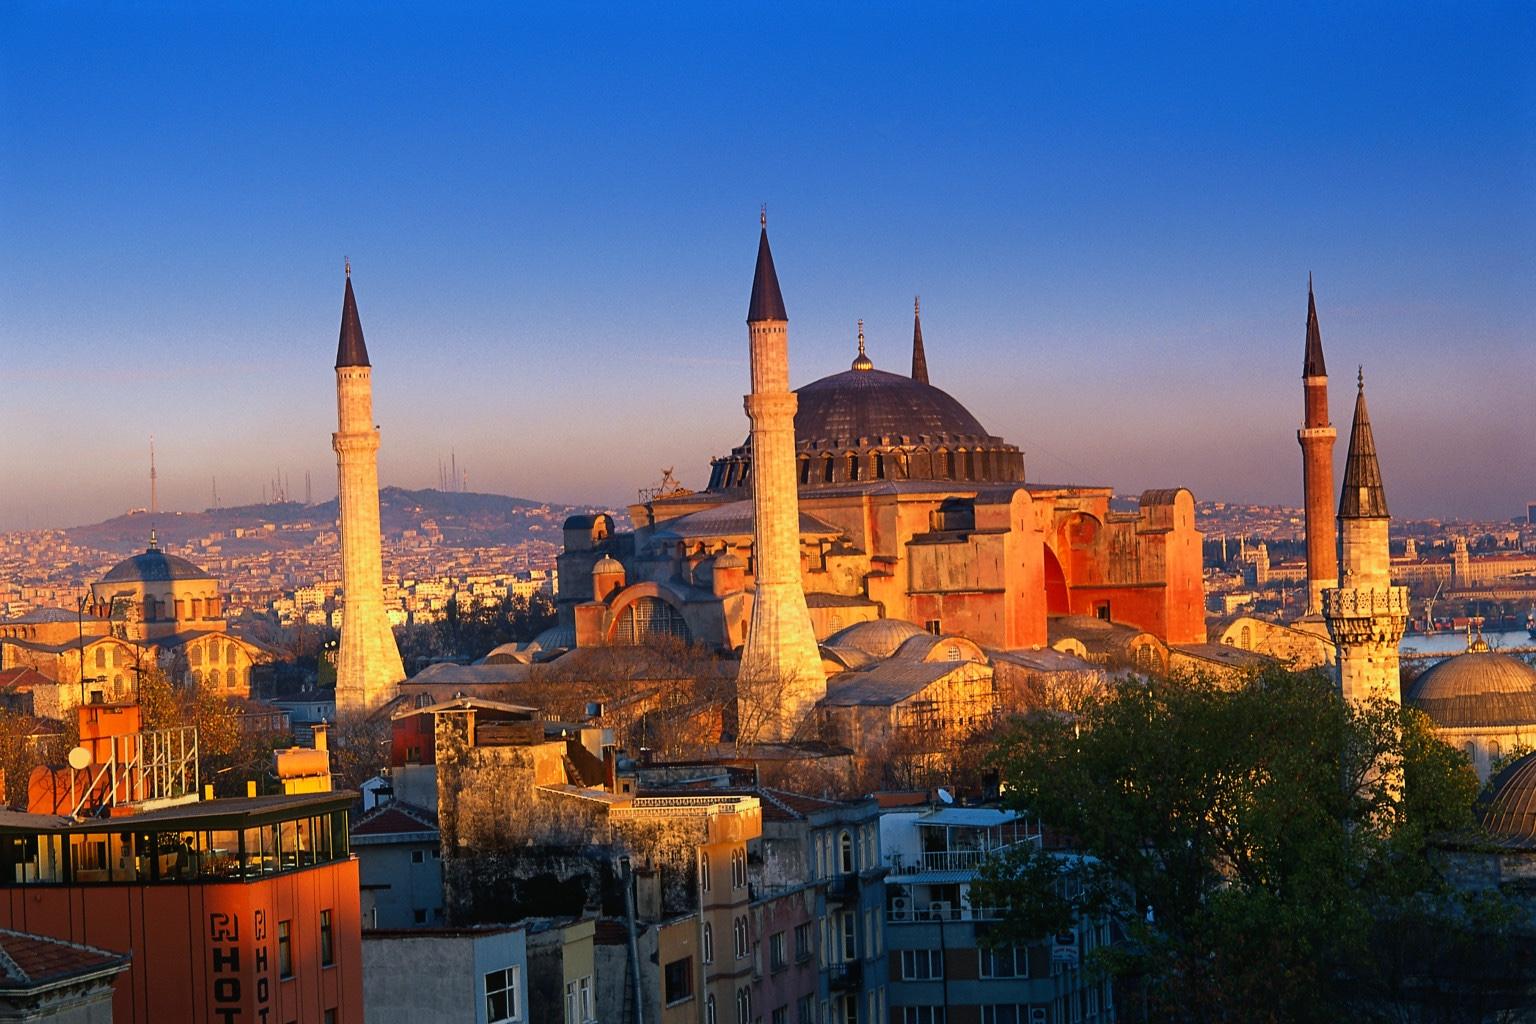 POSCA008 Aya Sofya, Istanbul, Turkey